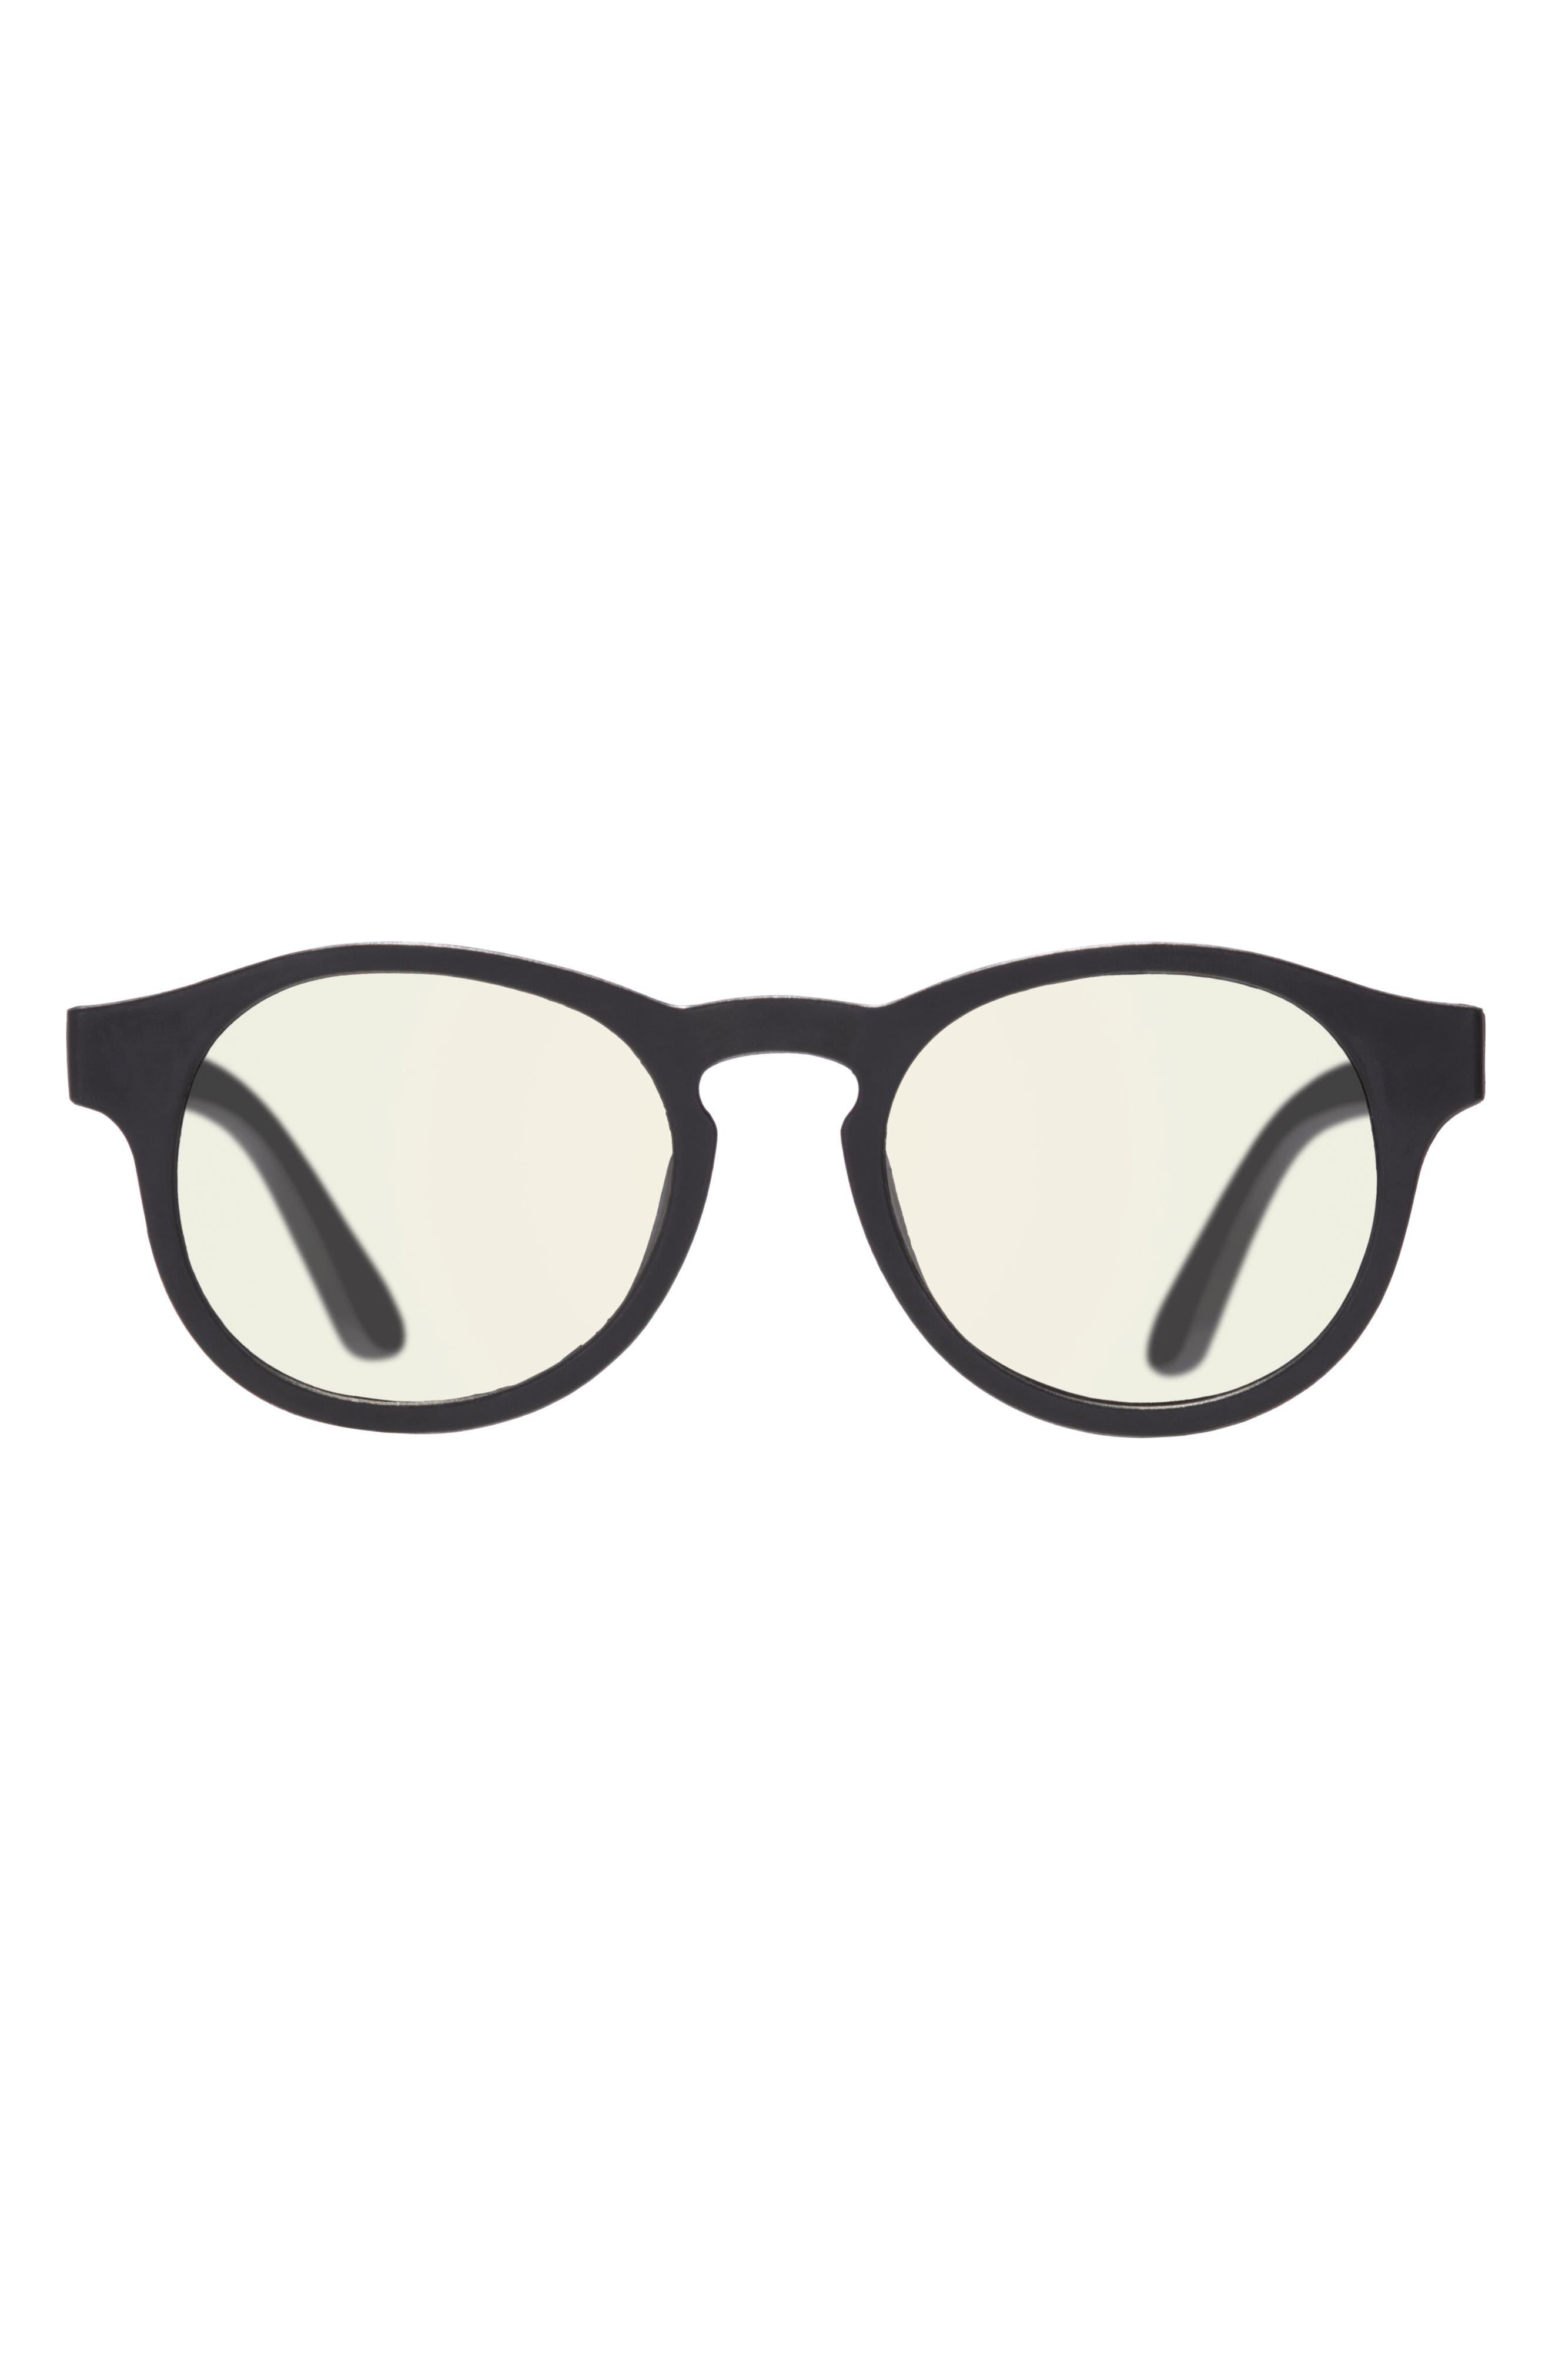 Image of BABIATORS Screen Savers Blue Light Glasses - Large